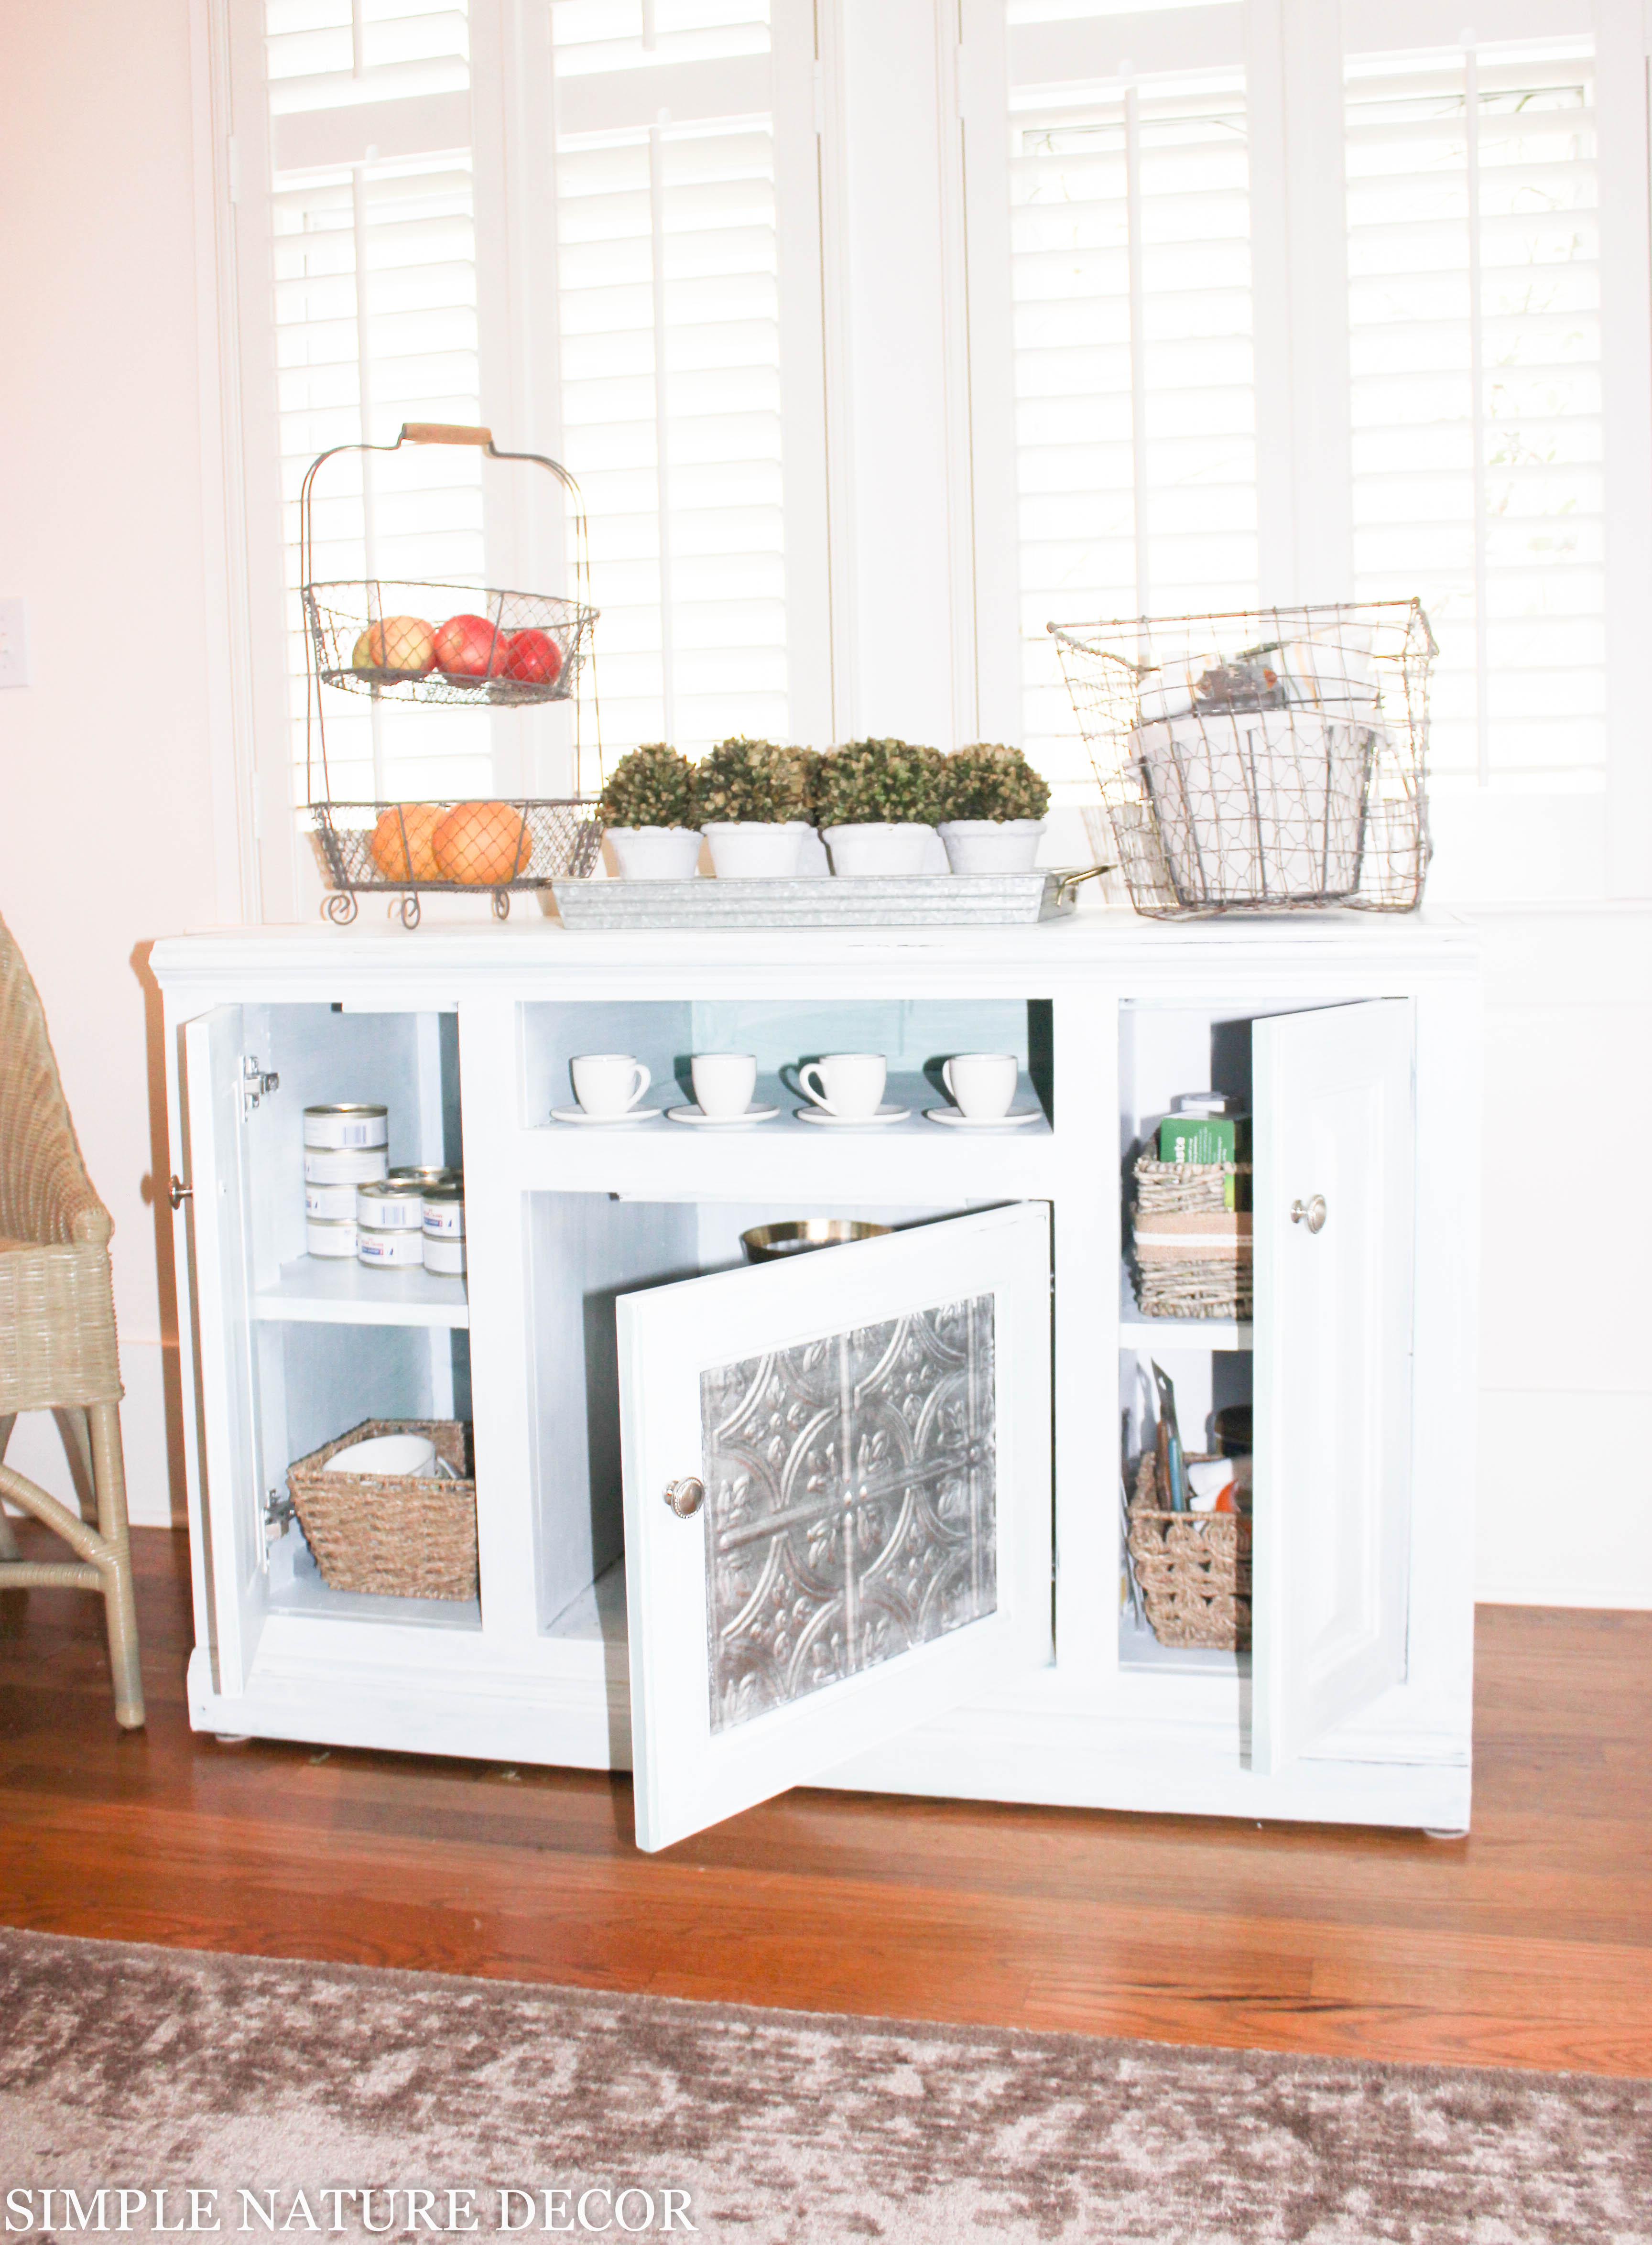 simple nature decor diy buffet cabinet ideas diy rustic buffet cabinet